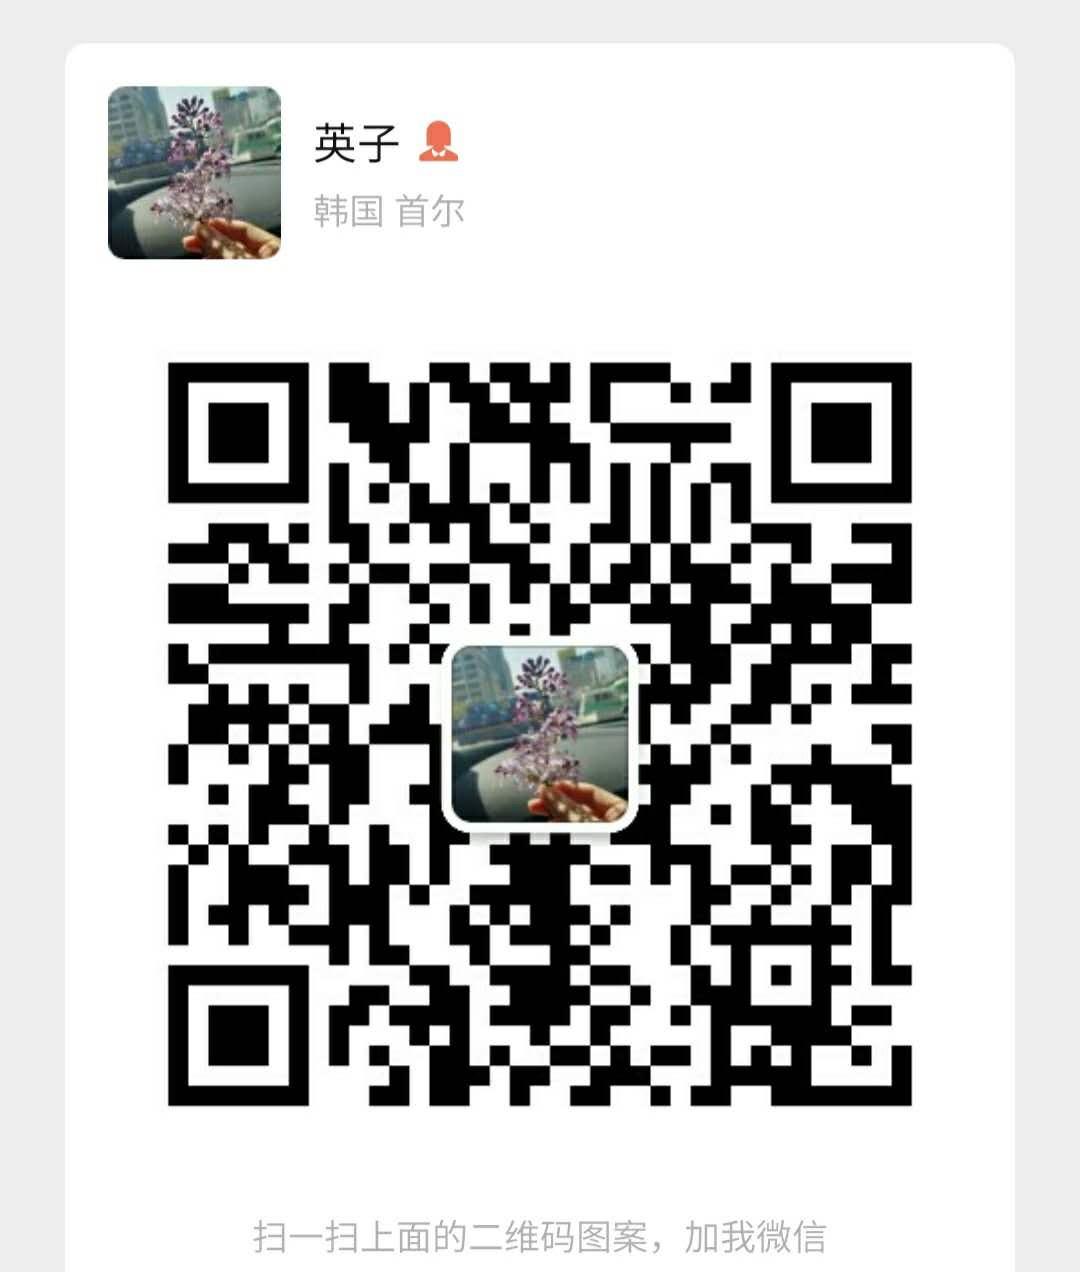 .\..\..\..\..\..\..\AppData\Local\Temp\WeChat Files\e09a0b8fcd80a9e957b0e9bdac32f755_.jpg